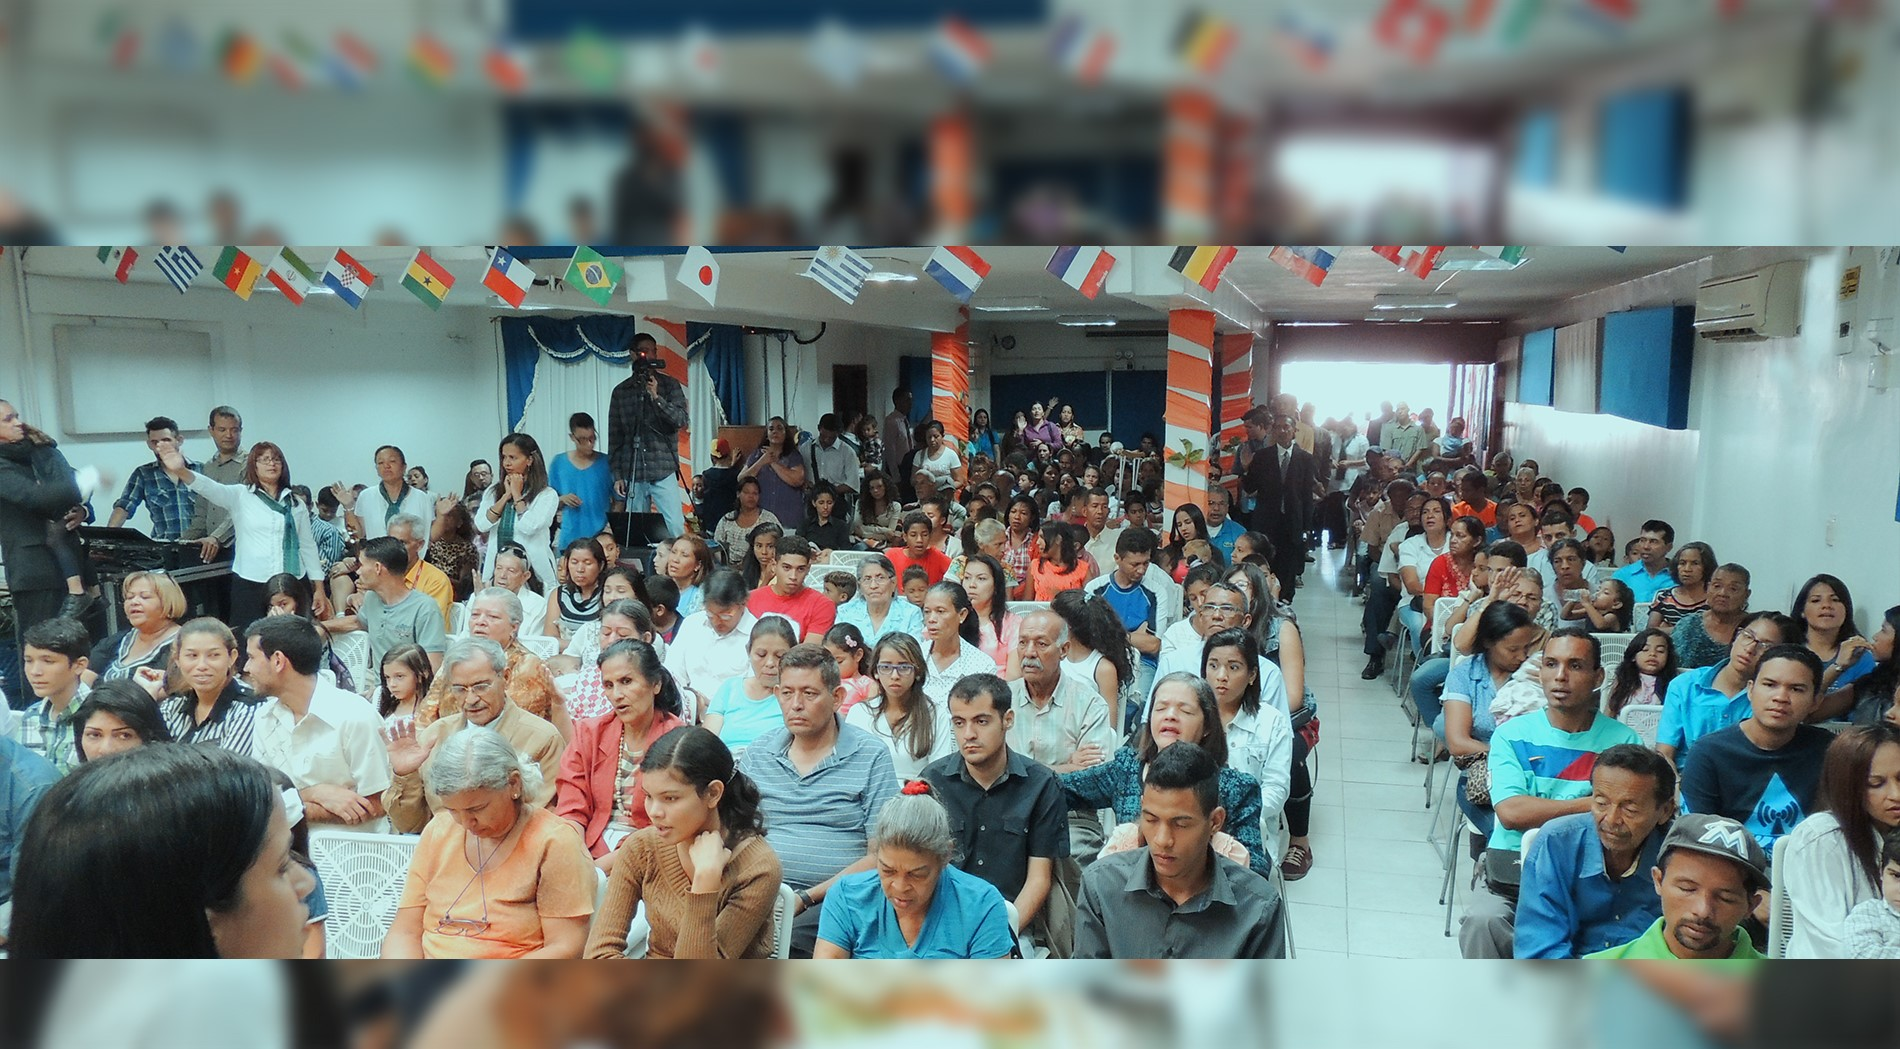 Iglesia Gloriosa Presencia - Guacara